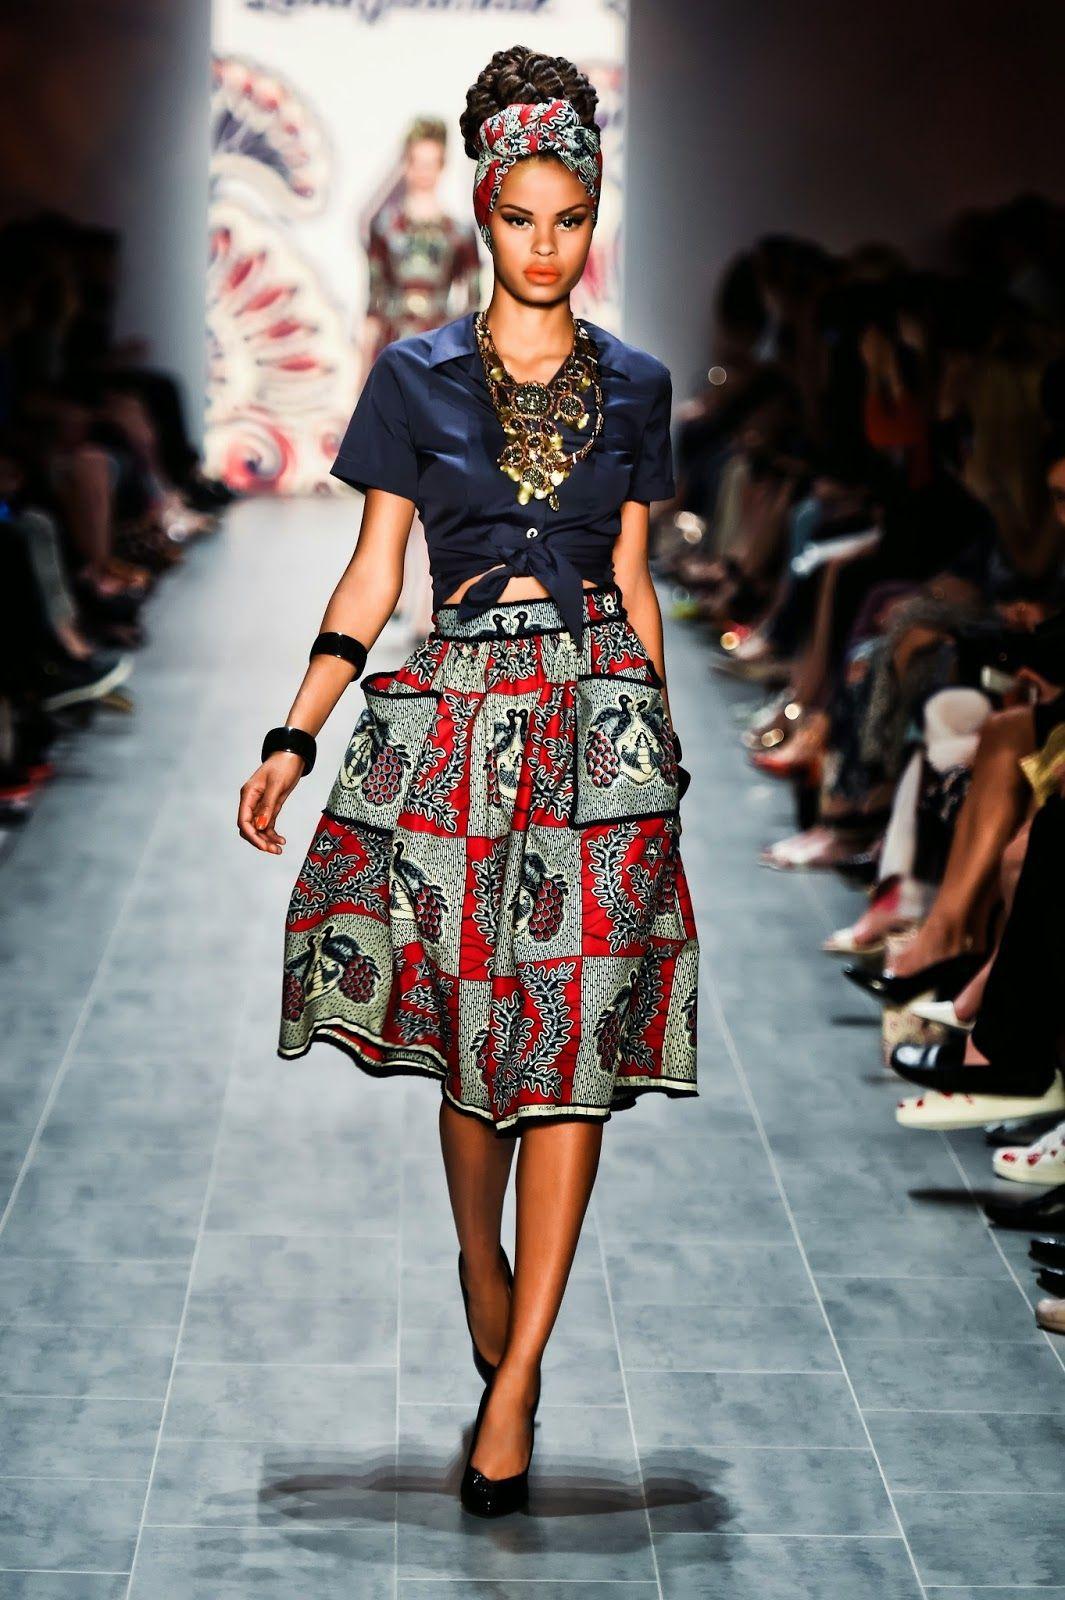 2f0b5f63a2cf1 African Prints in Fashion  Lena Hoschek  Austria s answer to Stella Jean